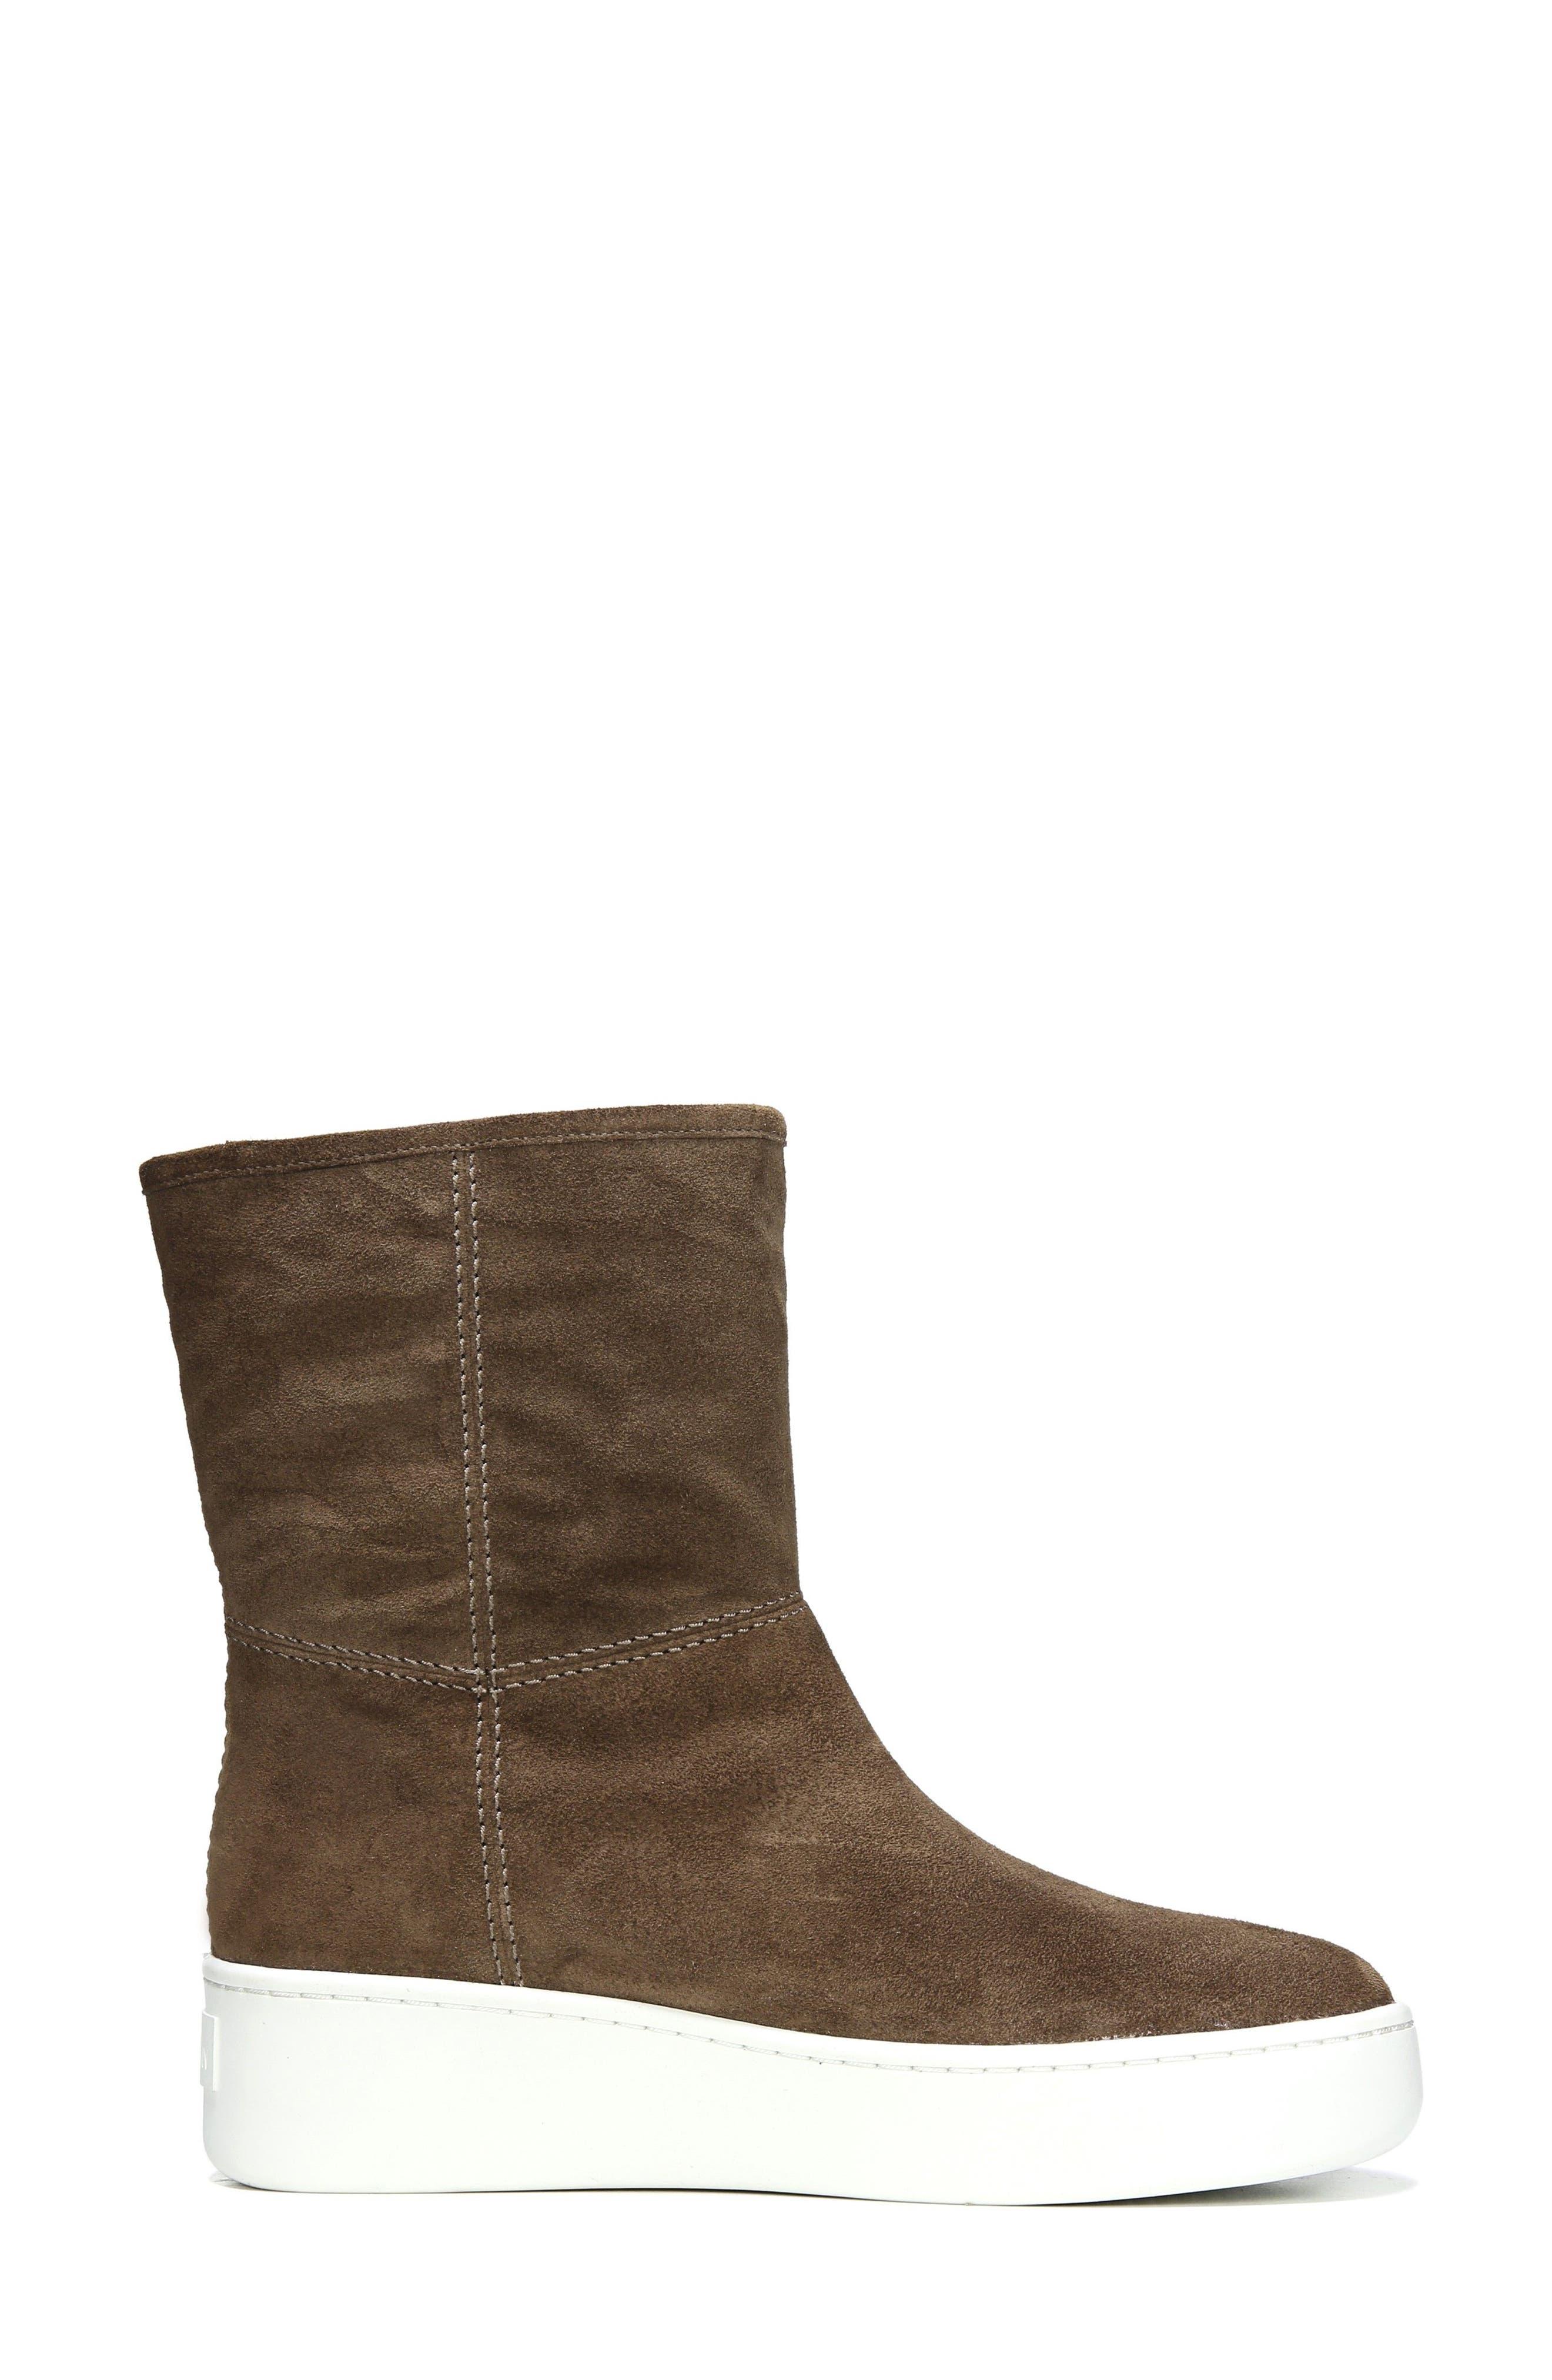 Alternate Image 3  - Via Spiga Elona Genuine Shearling Lined Sneaker Boot (Women)